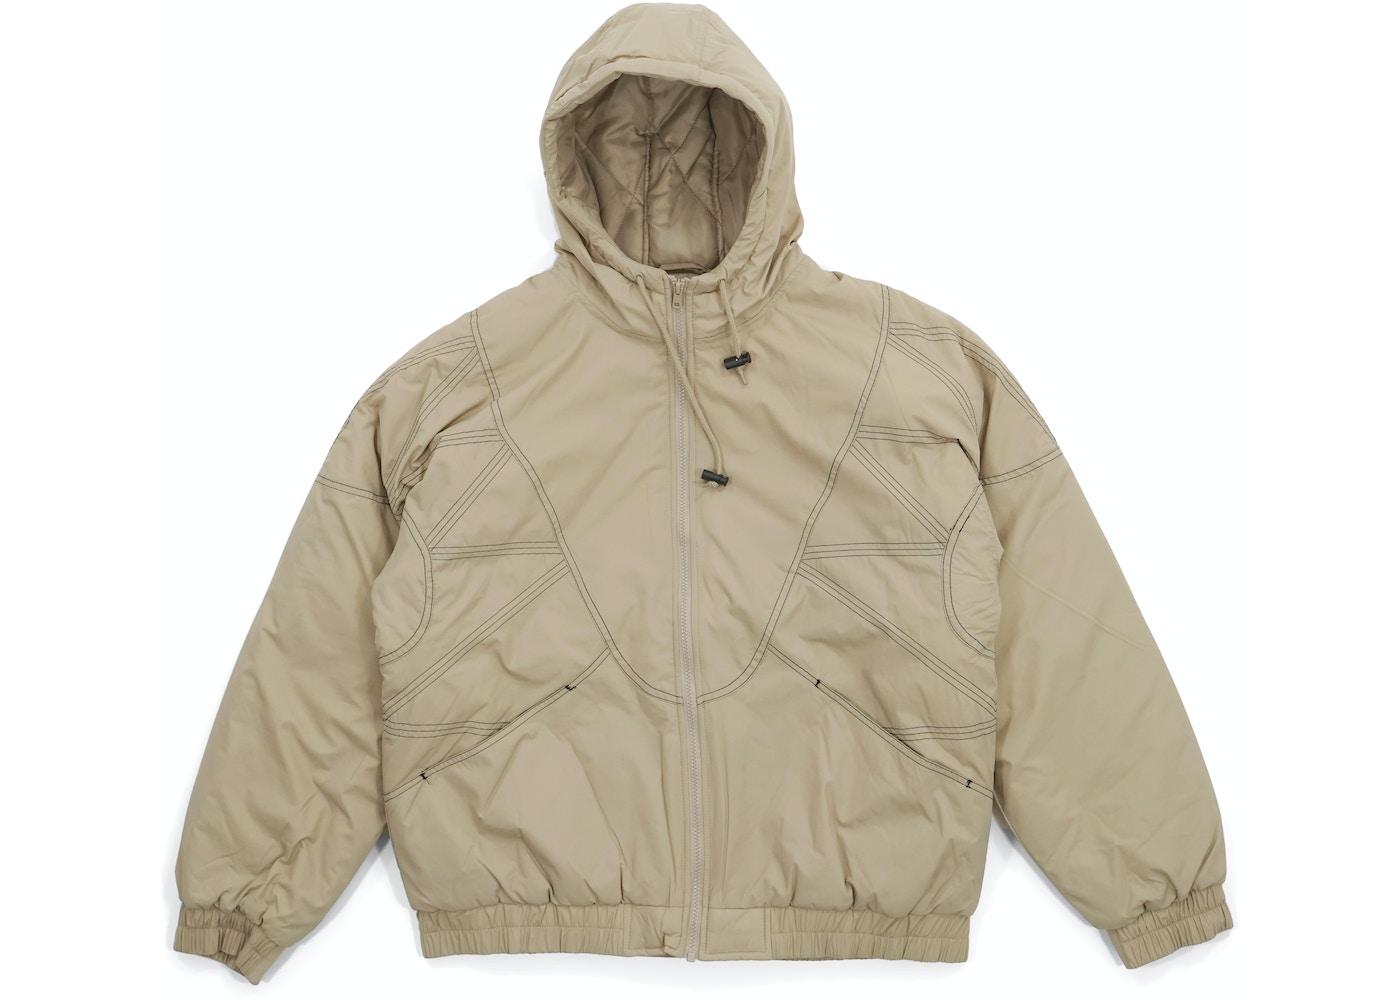 c82b71a6 Supreme Zig Zag Stitch Puffy Jacket Tan - FW18